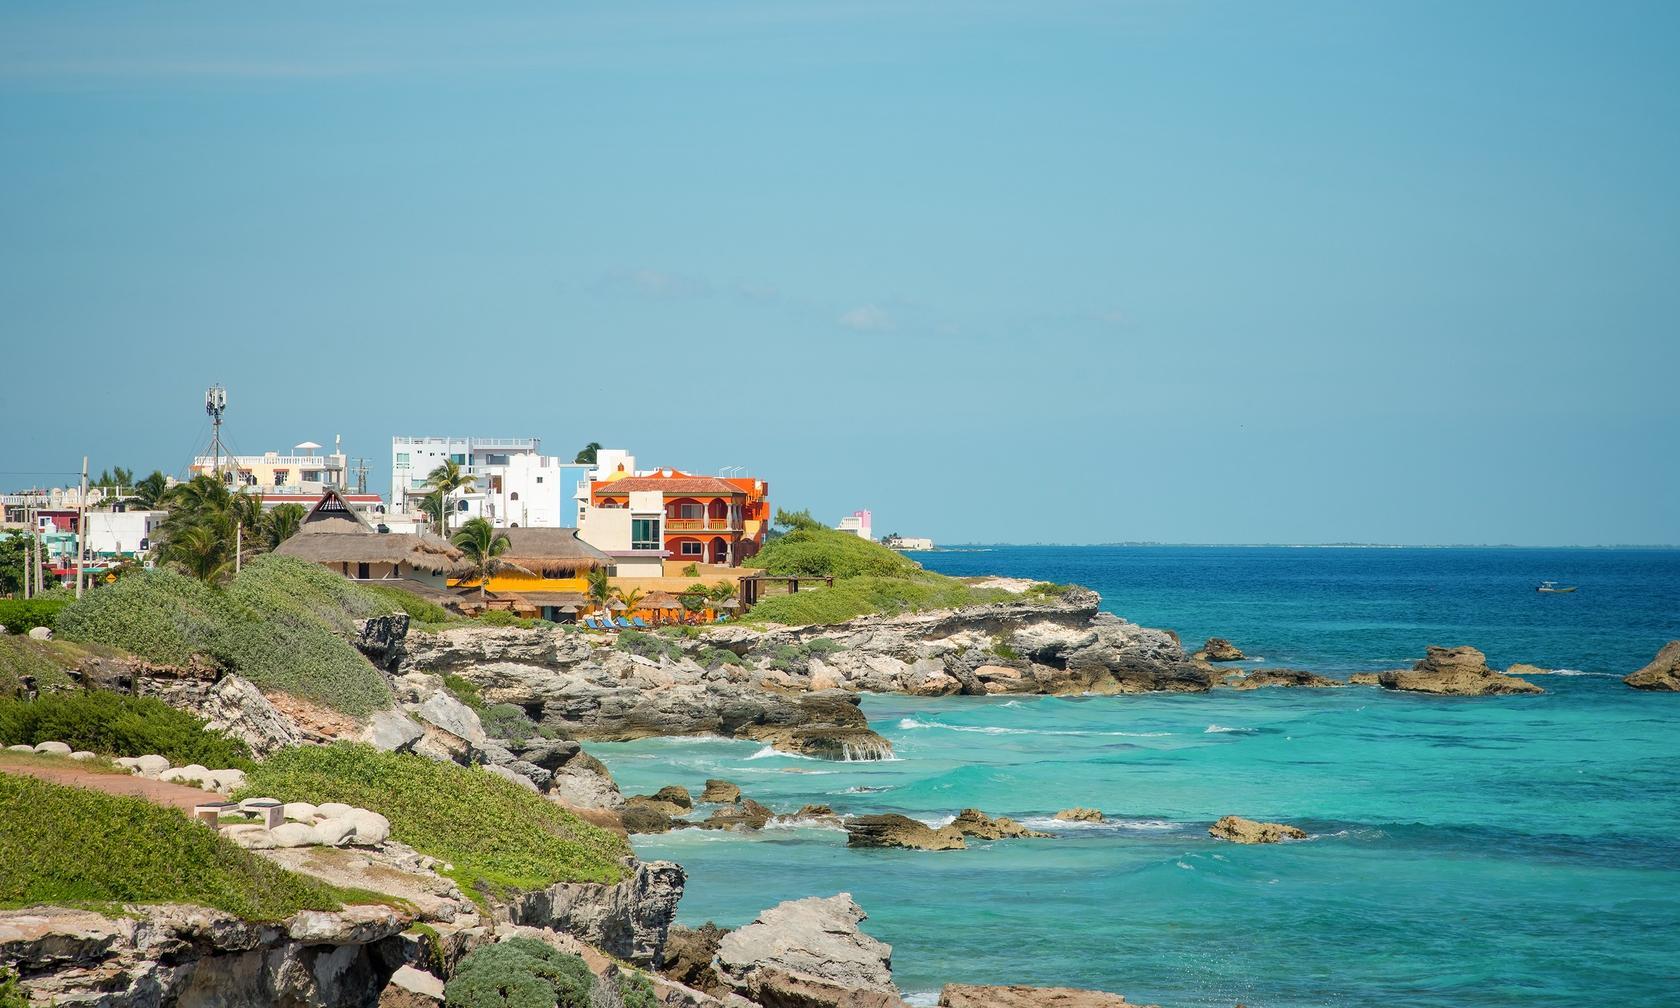 Vacation rentals in Isla Mujeres